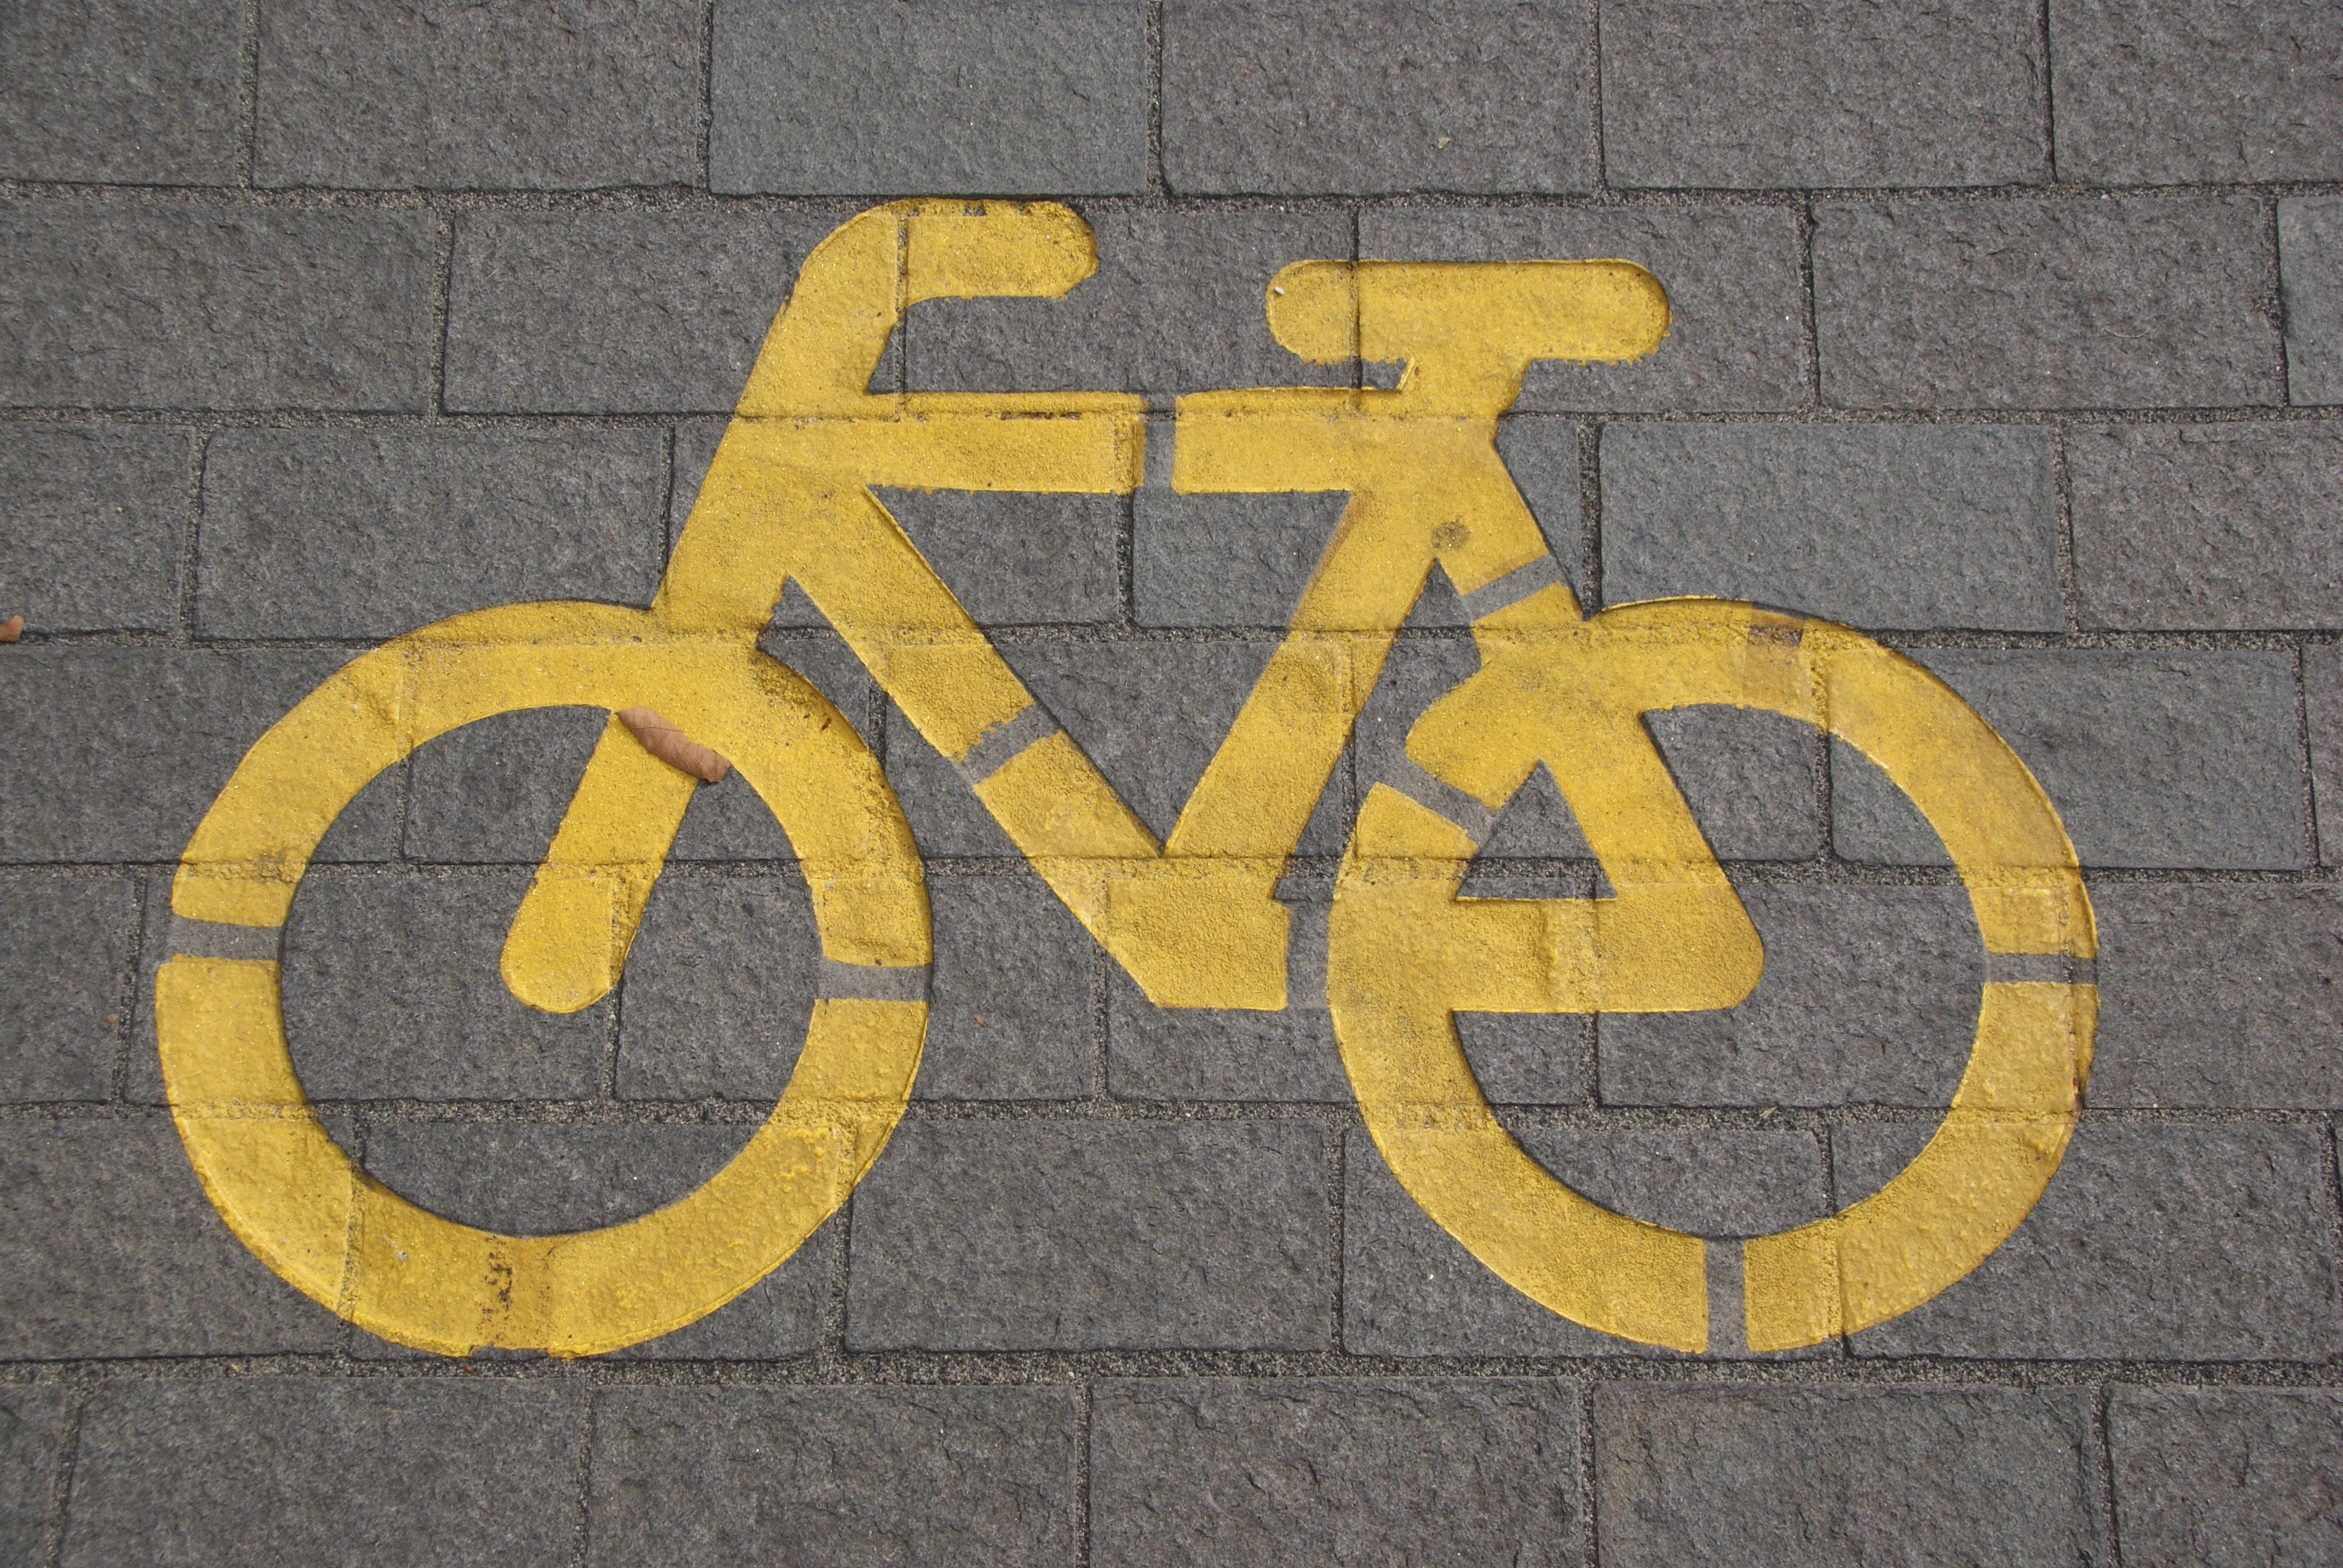 Bicycle Lane on Gray Concrete Road, Asphalt, Pavement, Symbol, Street, HQ Photo